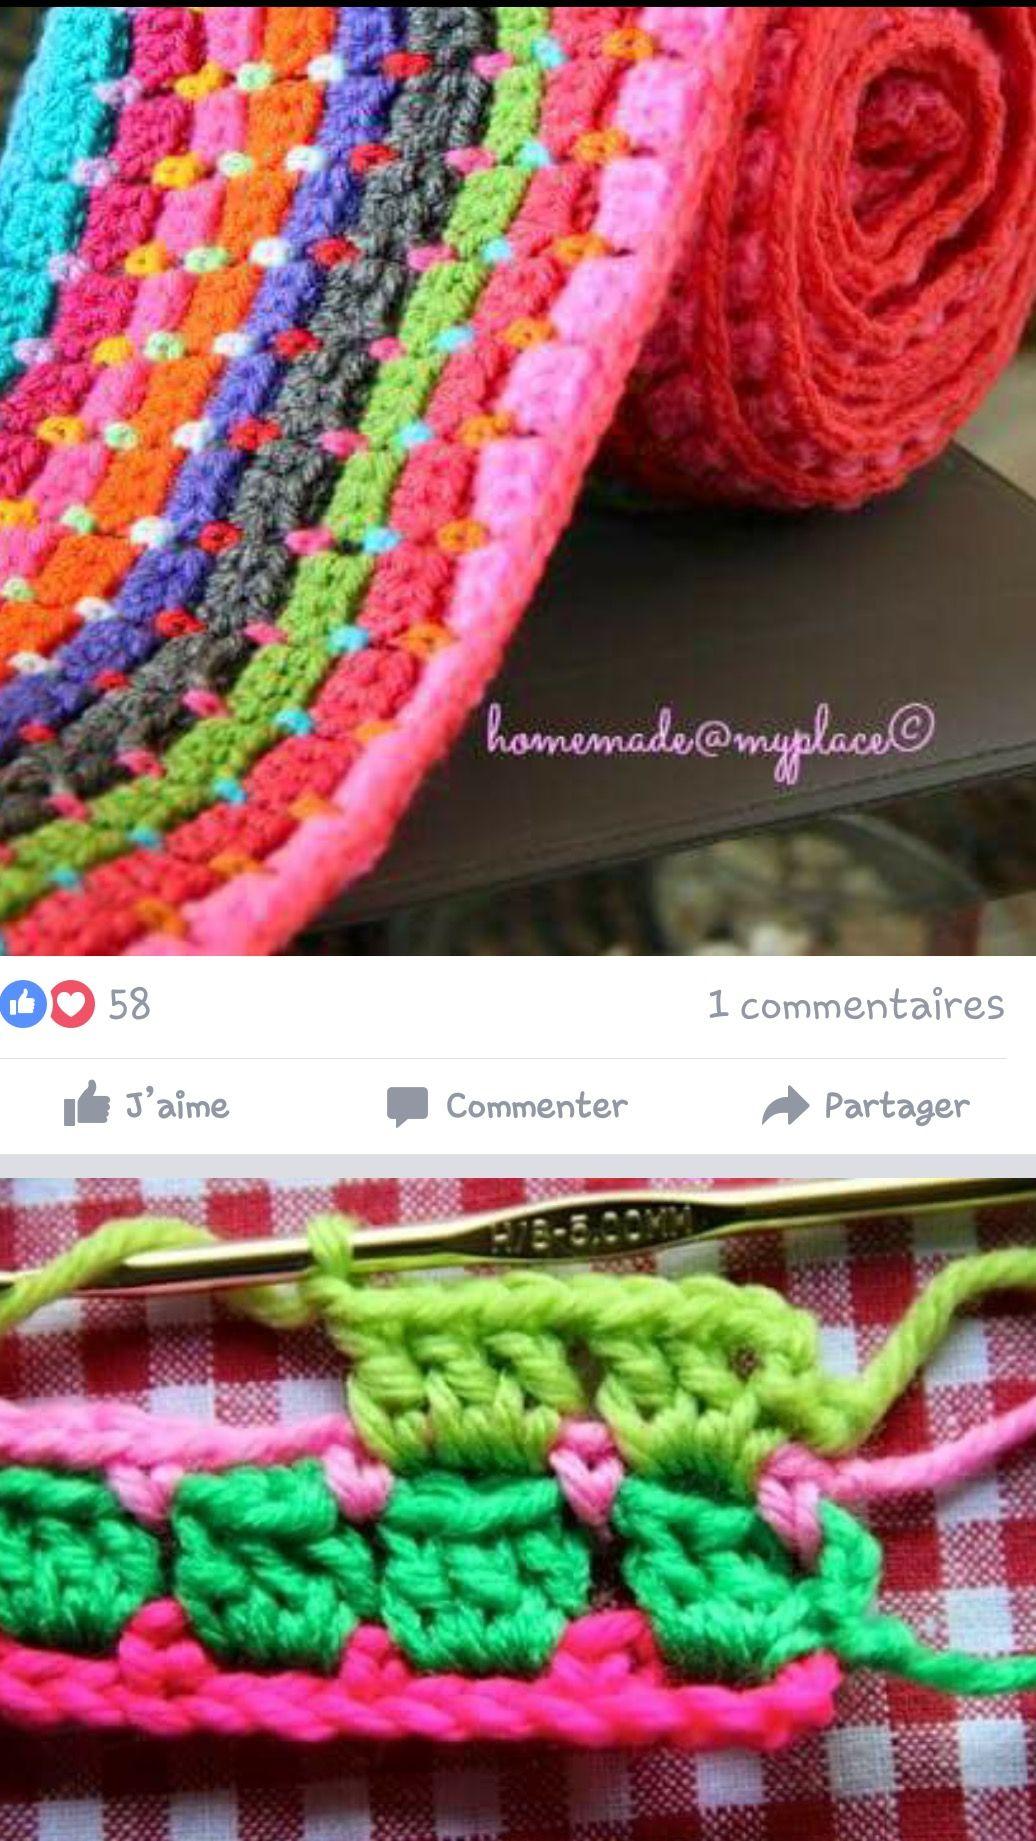 Pin de Myriam Fosserat en Crochet | Pinterest | Tejido, Cobija y ...